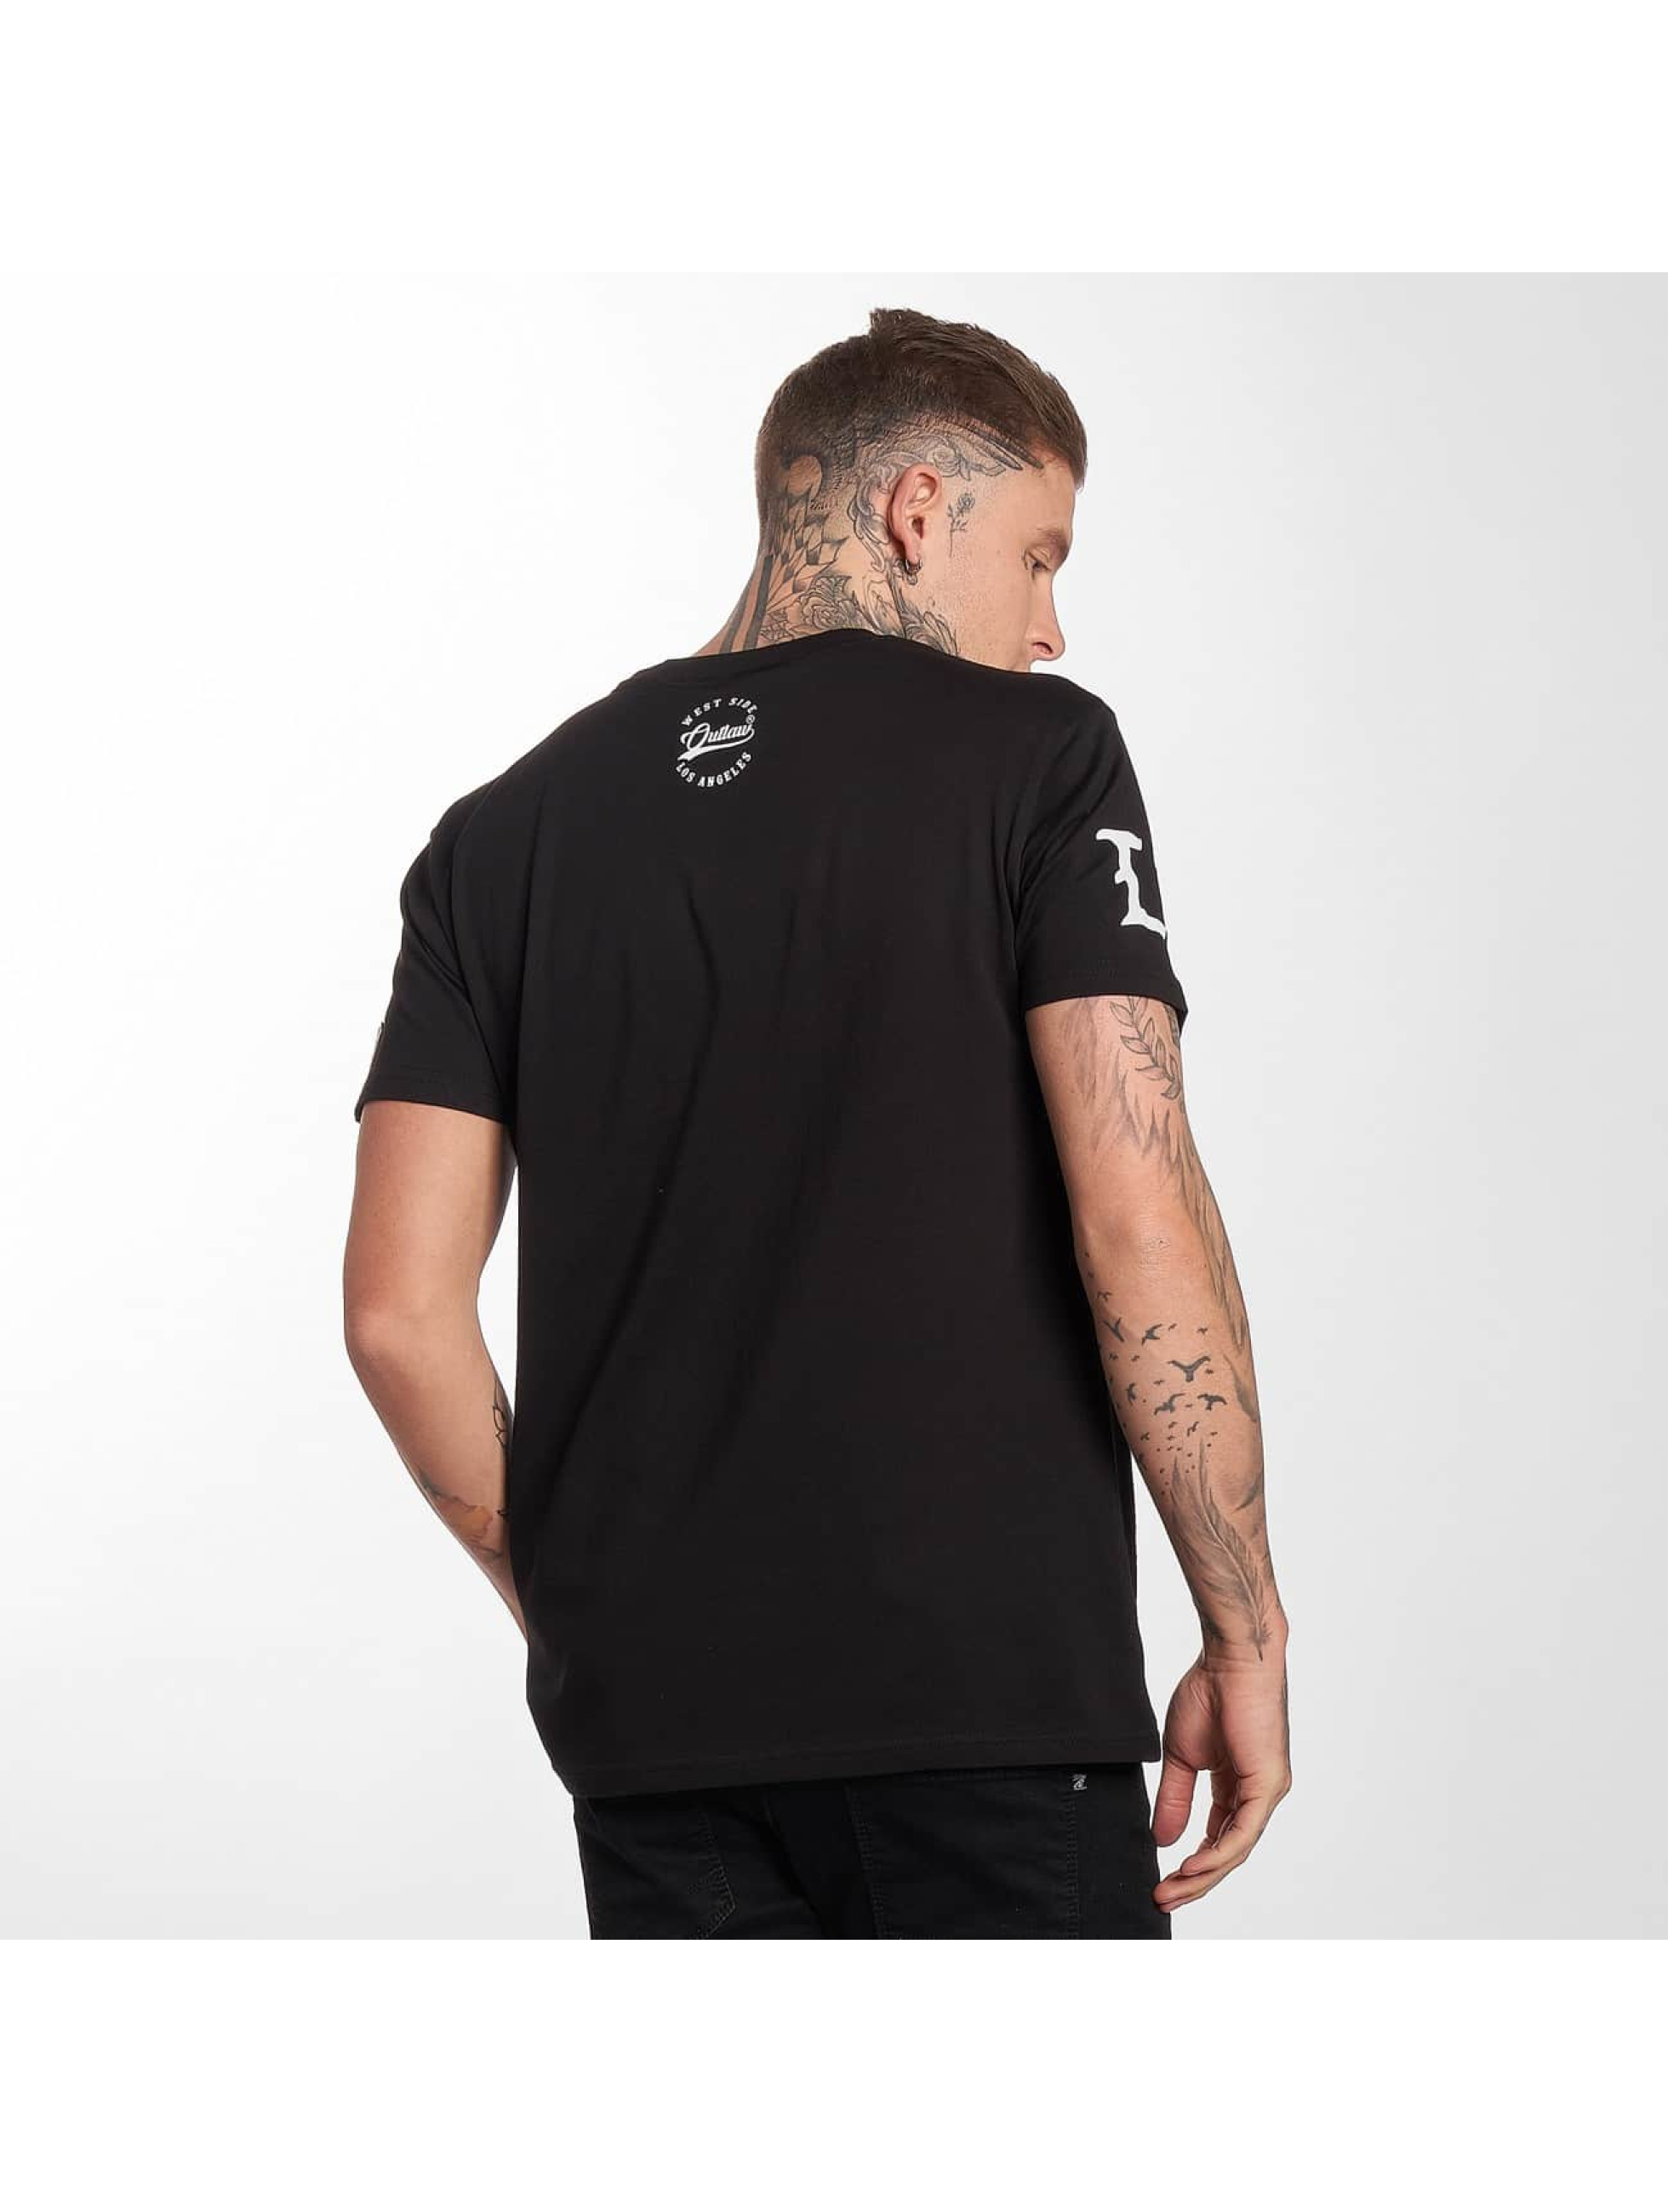 Outlaw T-Shirt Outlaw Customs noir